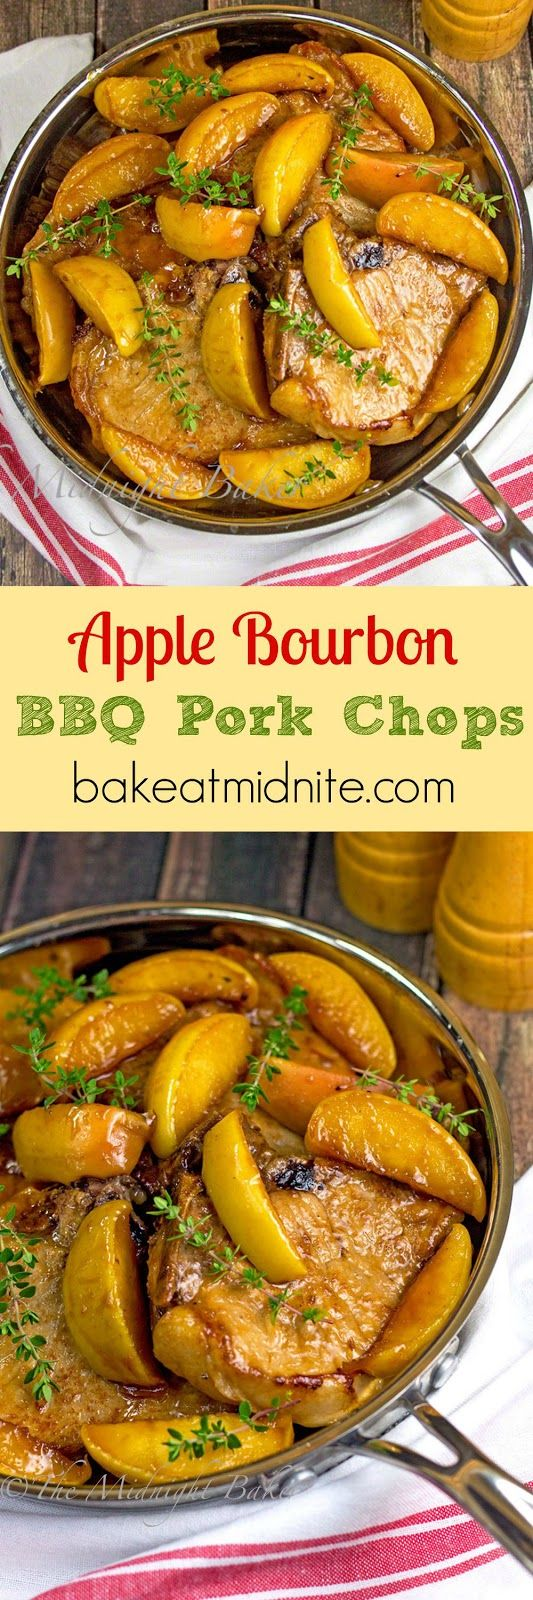 Apple Bourbon BBQ Pork Chops | bakeatmidnite.com